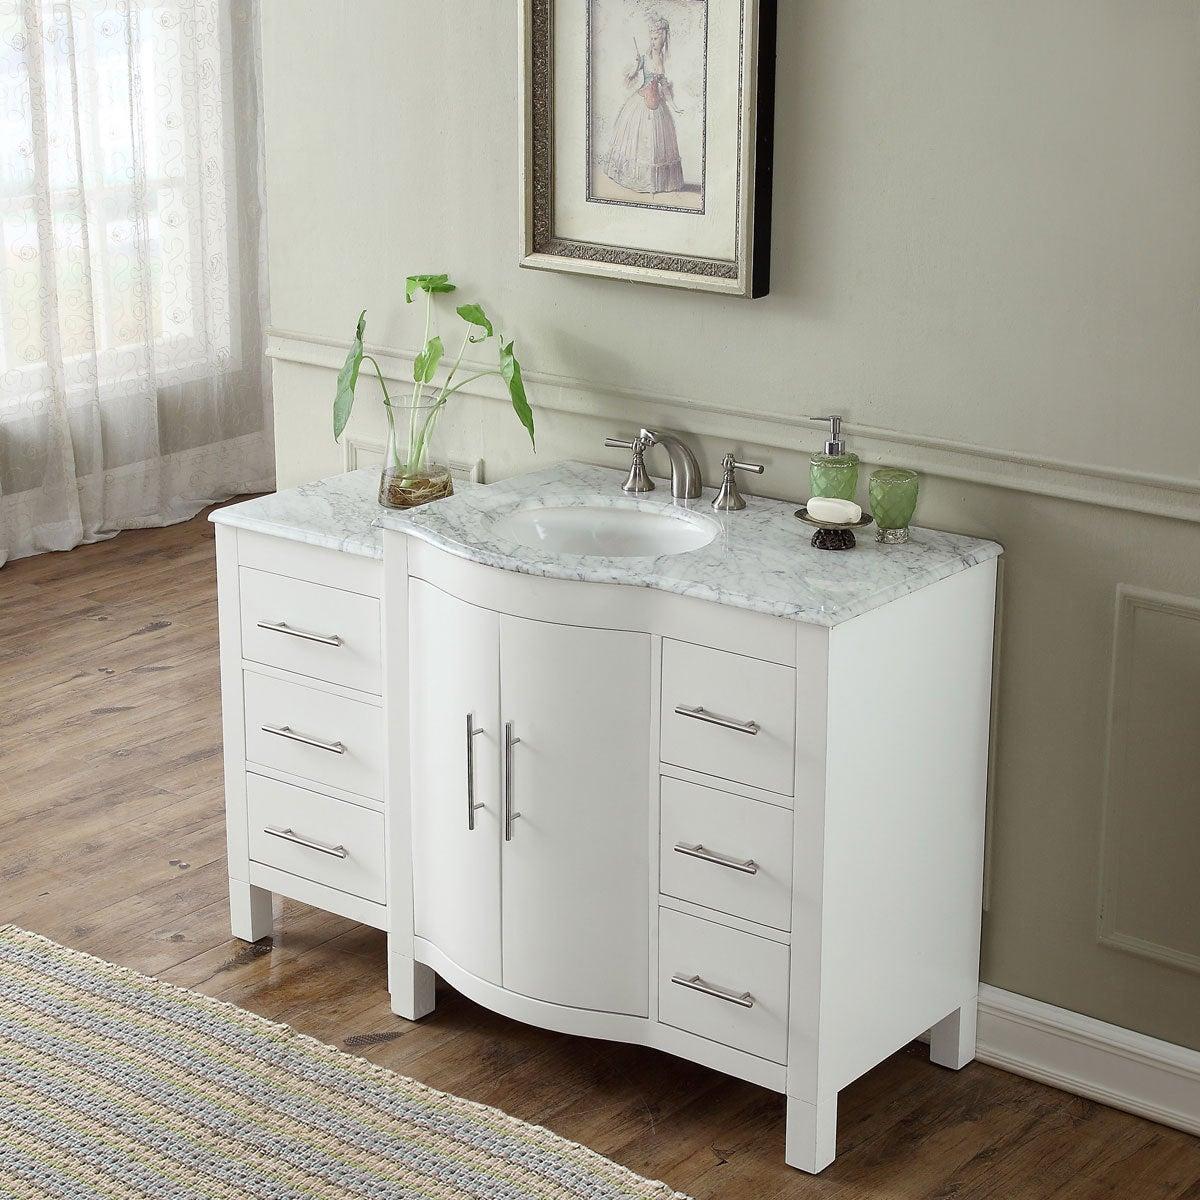 Silkroad Exclusive 53 5 Contemporary Bathroom Vanity Single Sink Cabinet Free Shipping Today 14443145